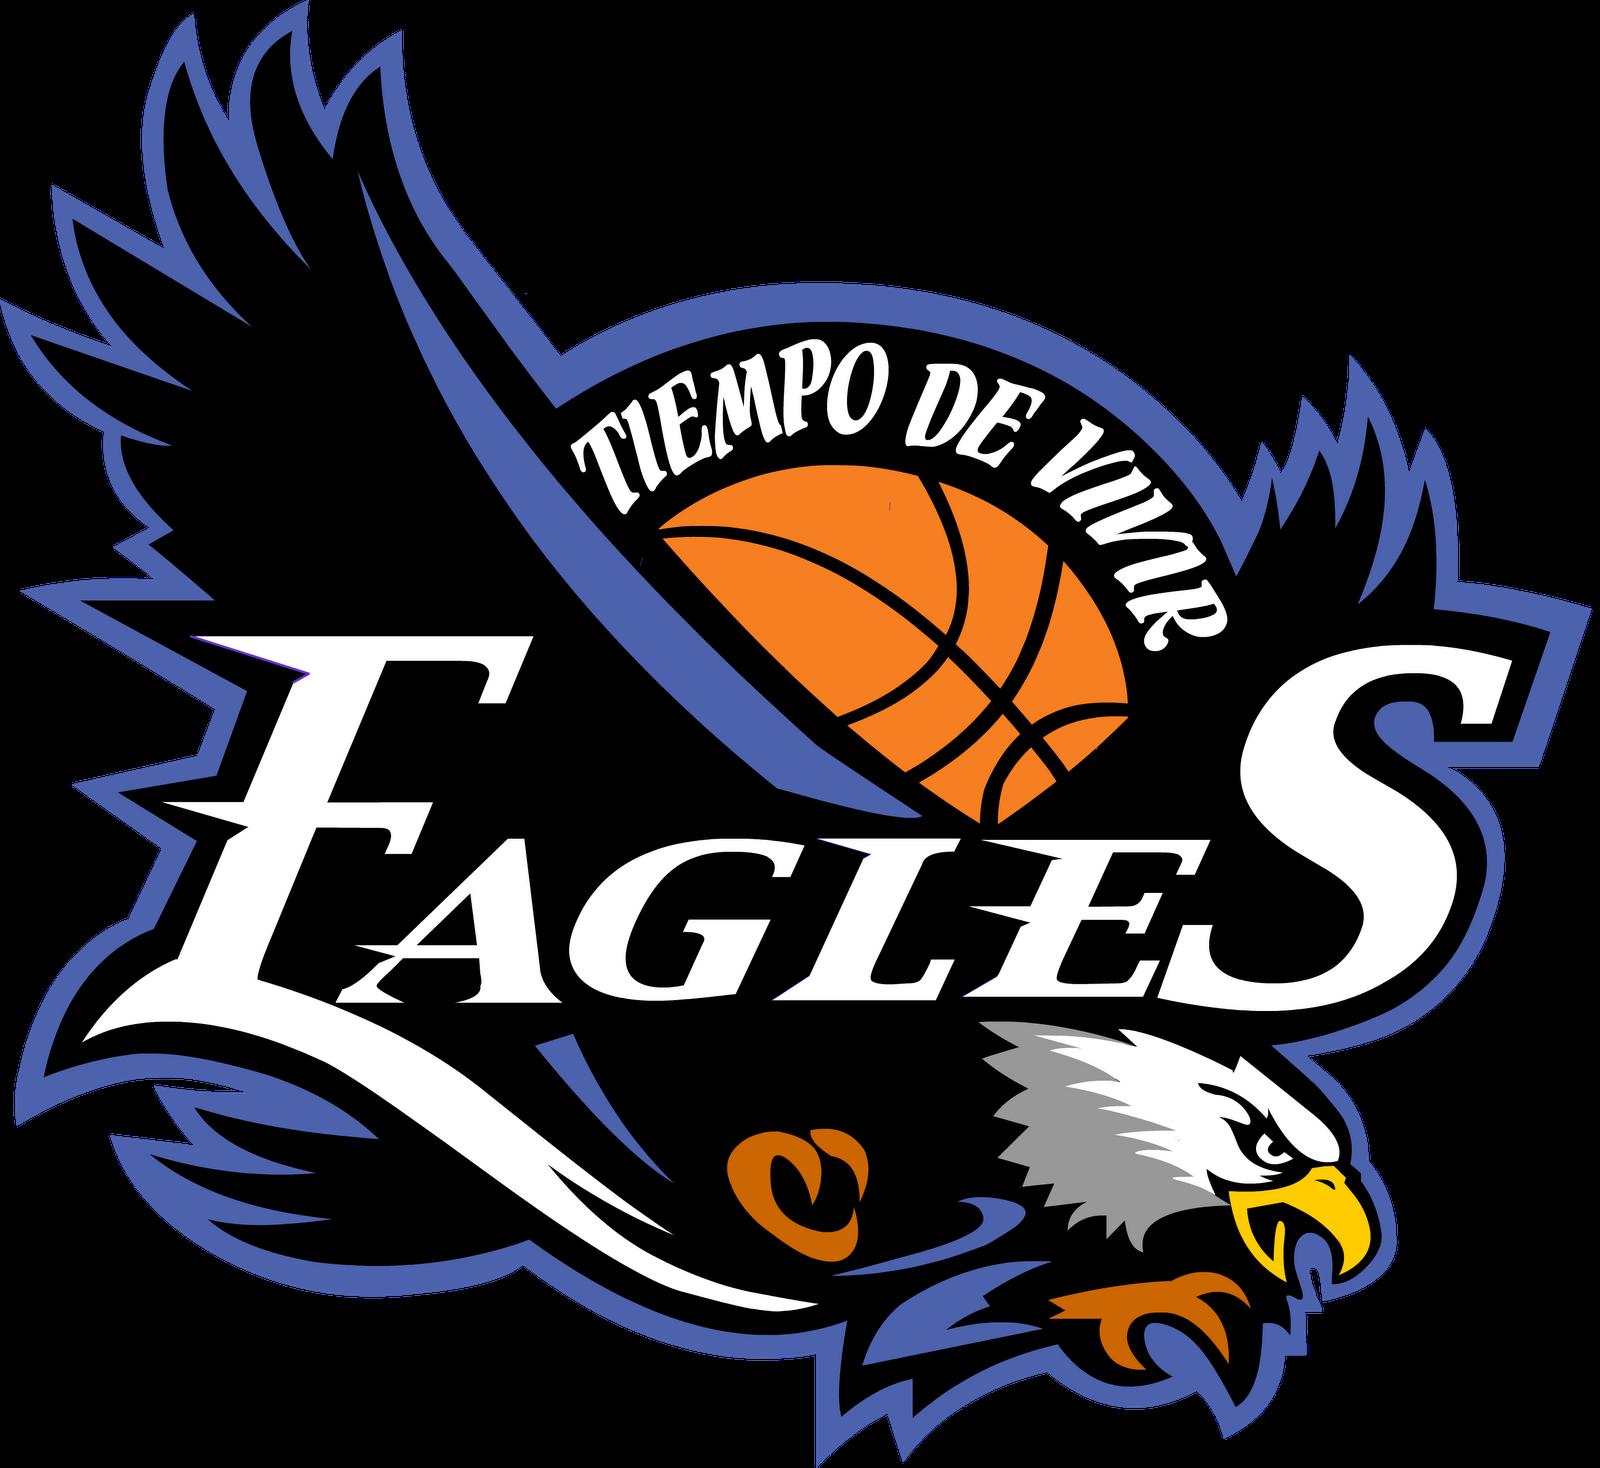 Eagles Basketball Team Logo Clipart.